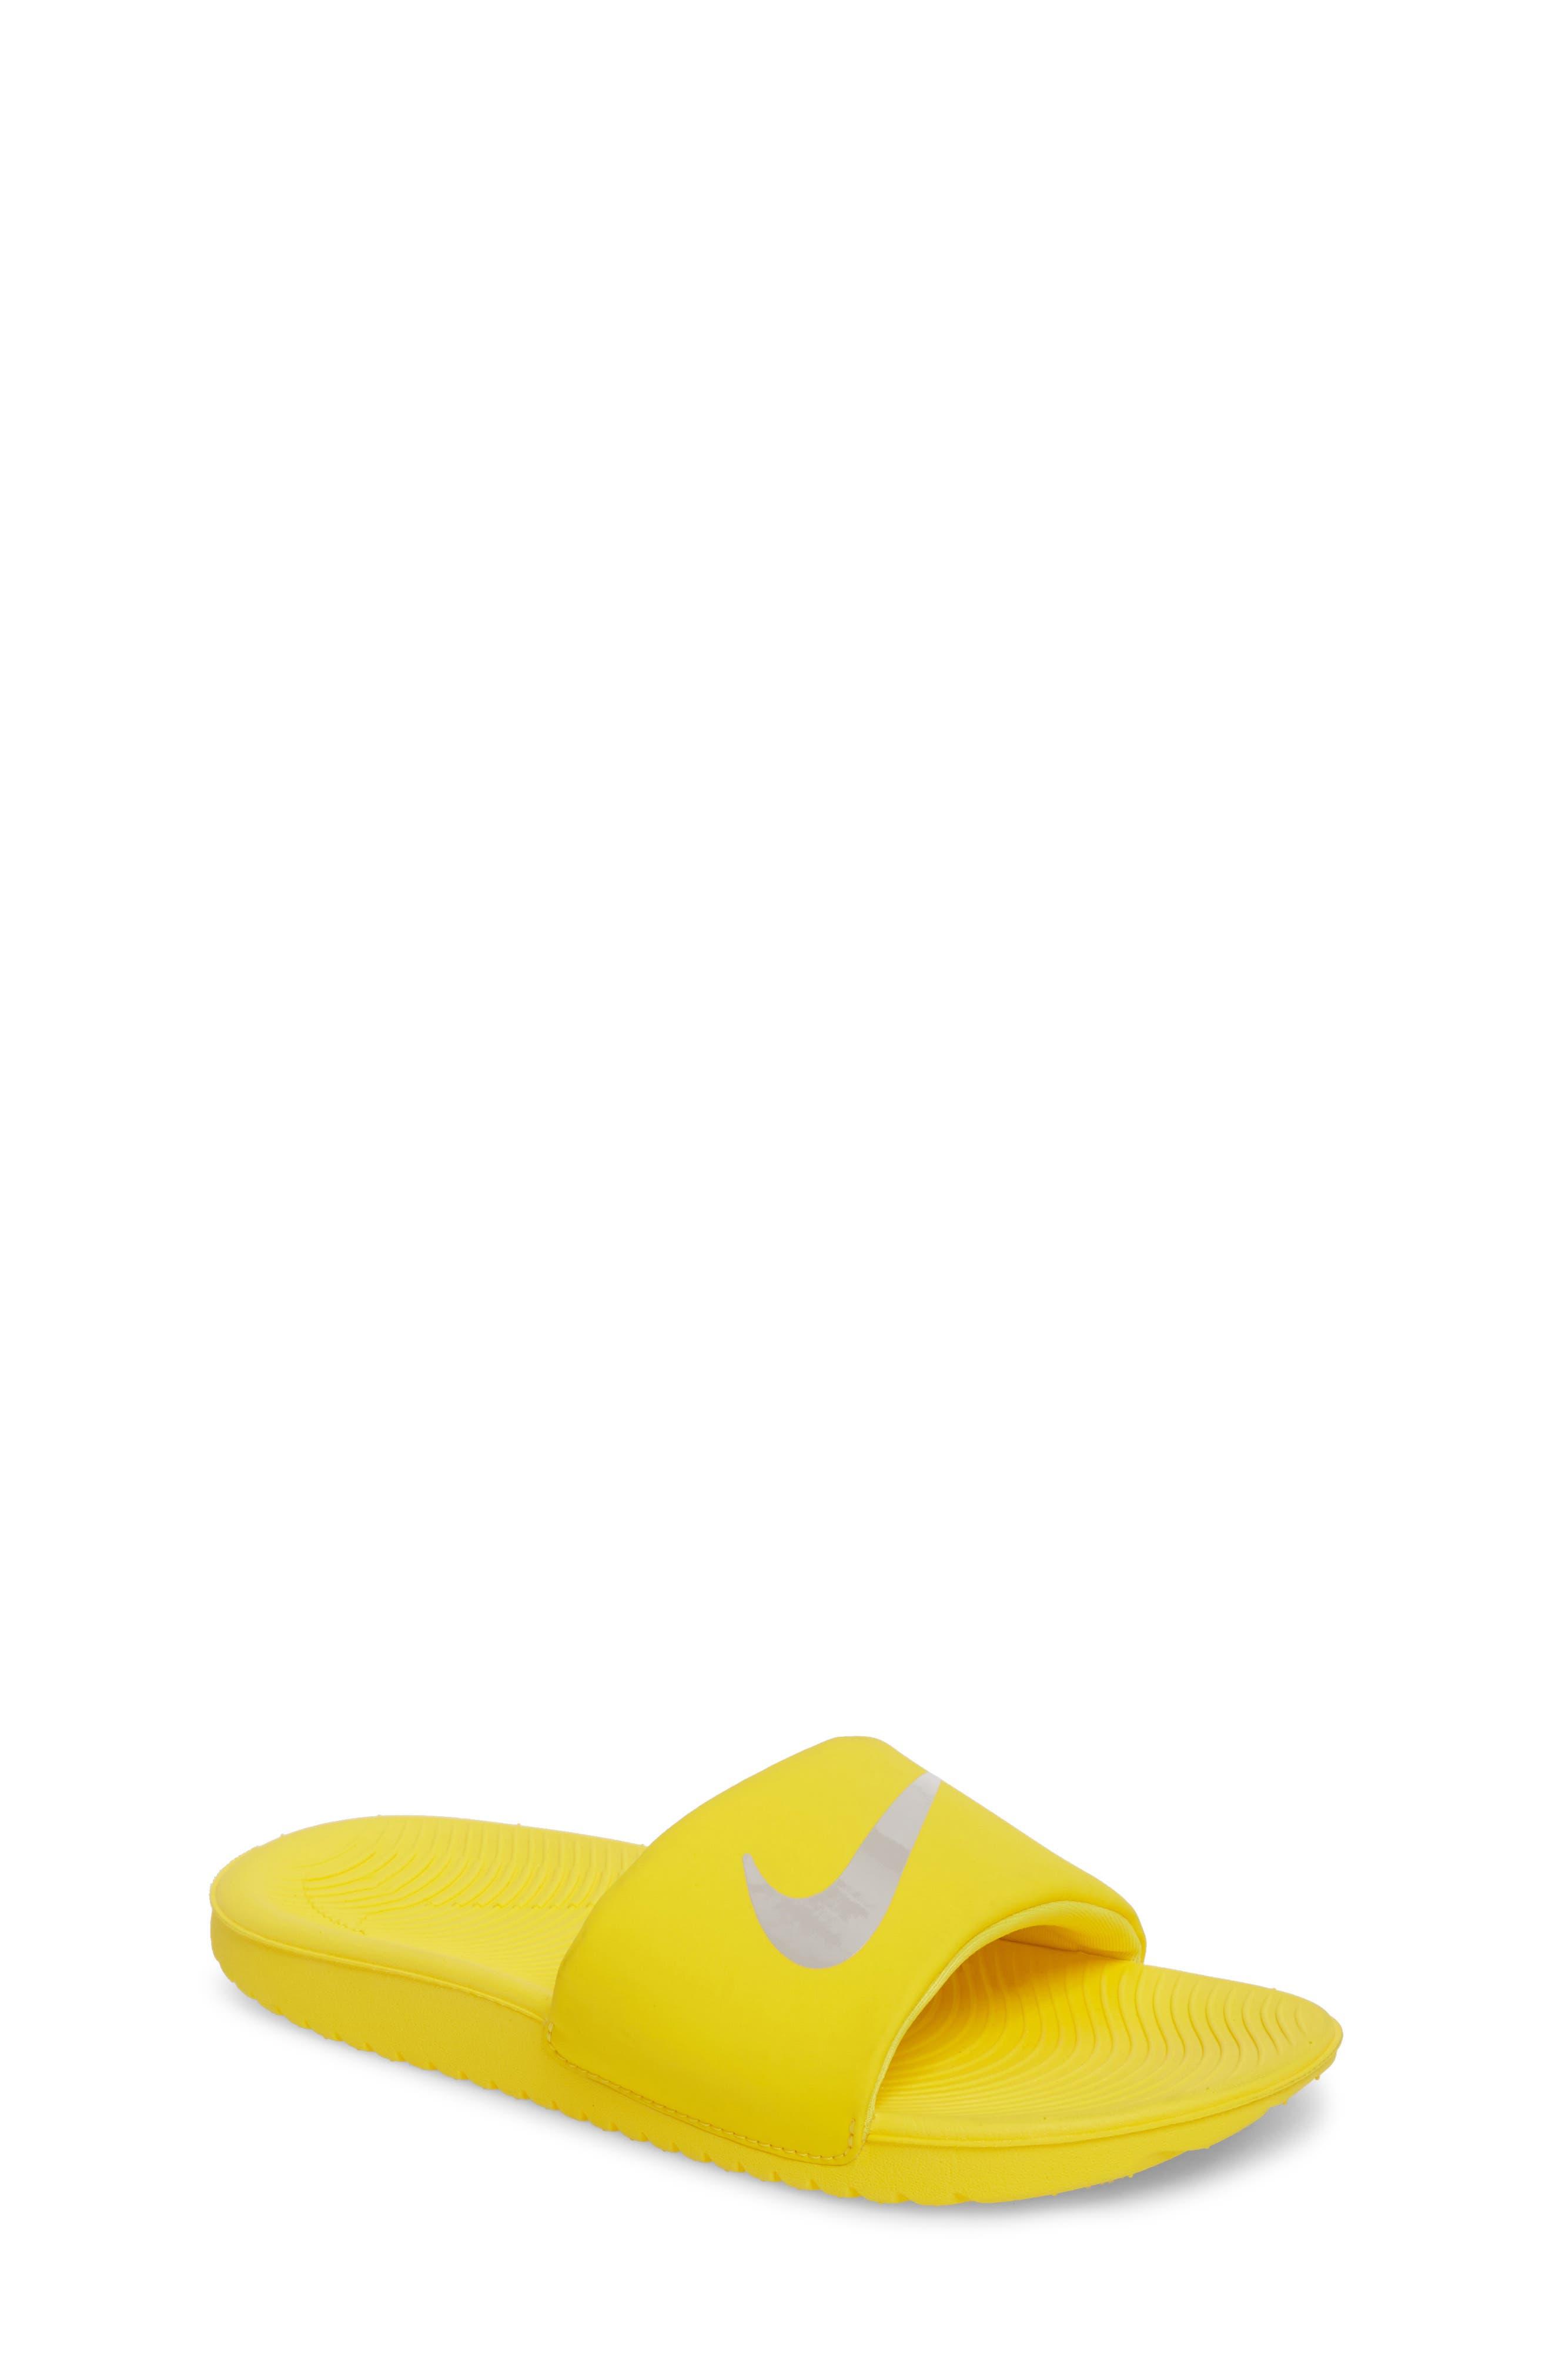 'Kawa' Slide Sandal,                             Main thumbnail 1, color,                             Yellow/ Atmosphere Grey